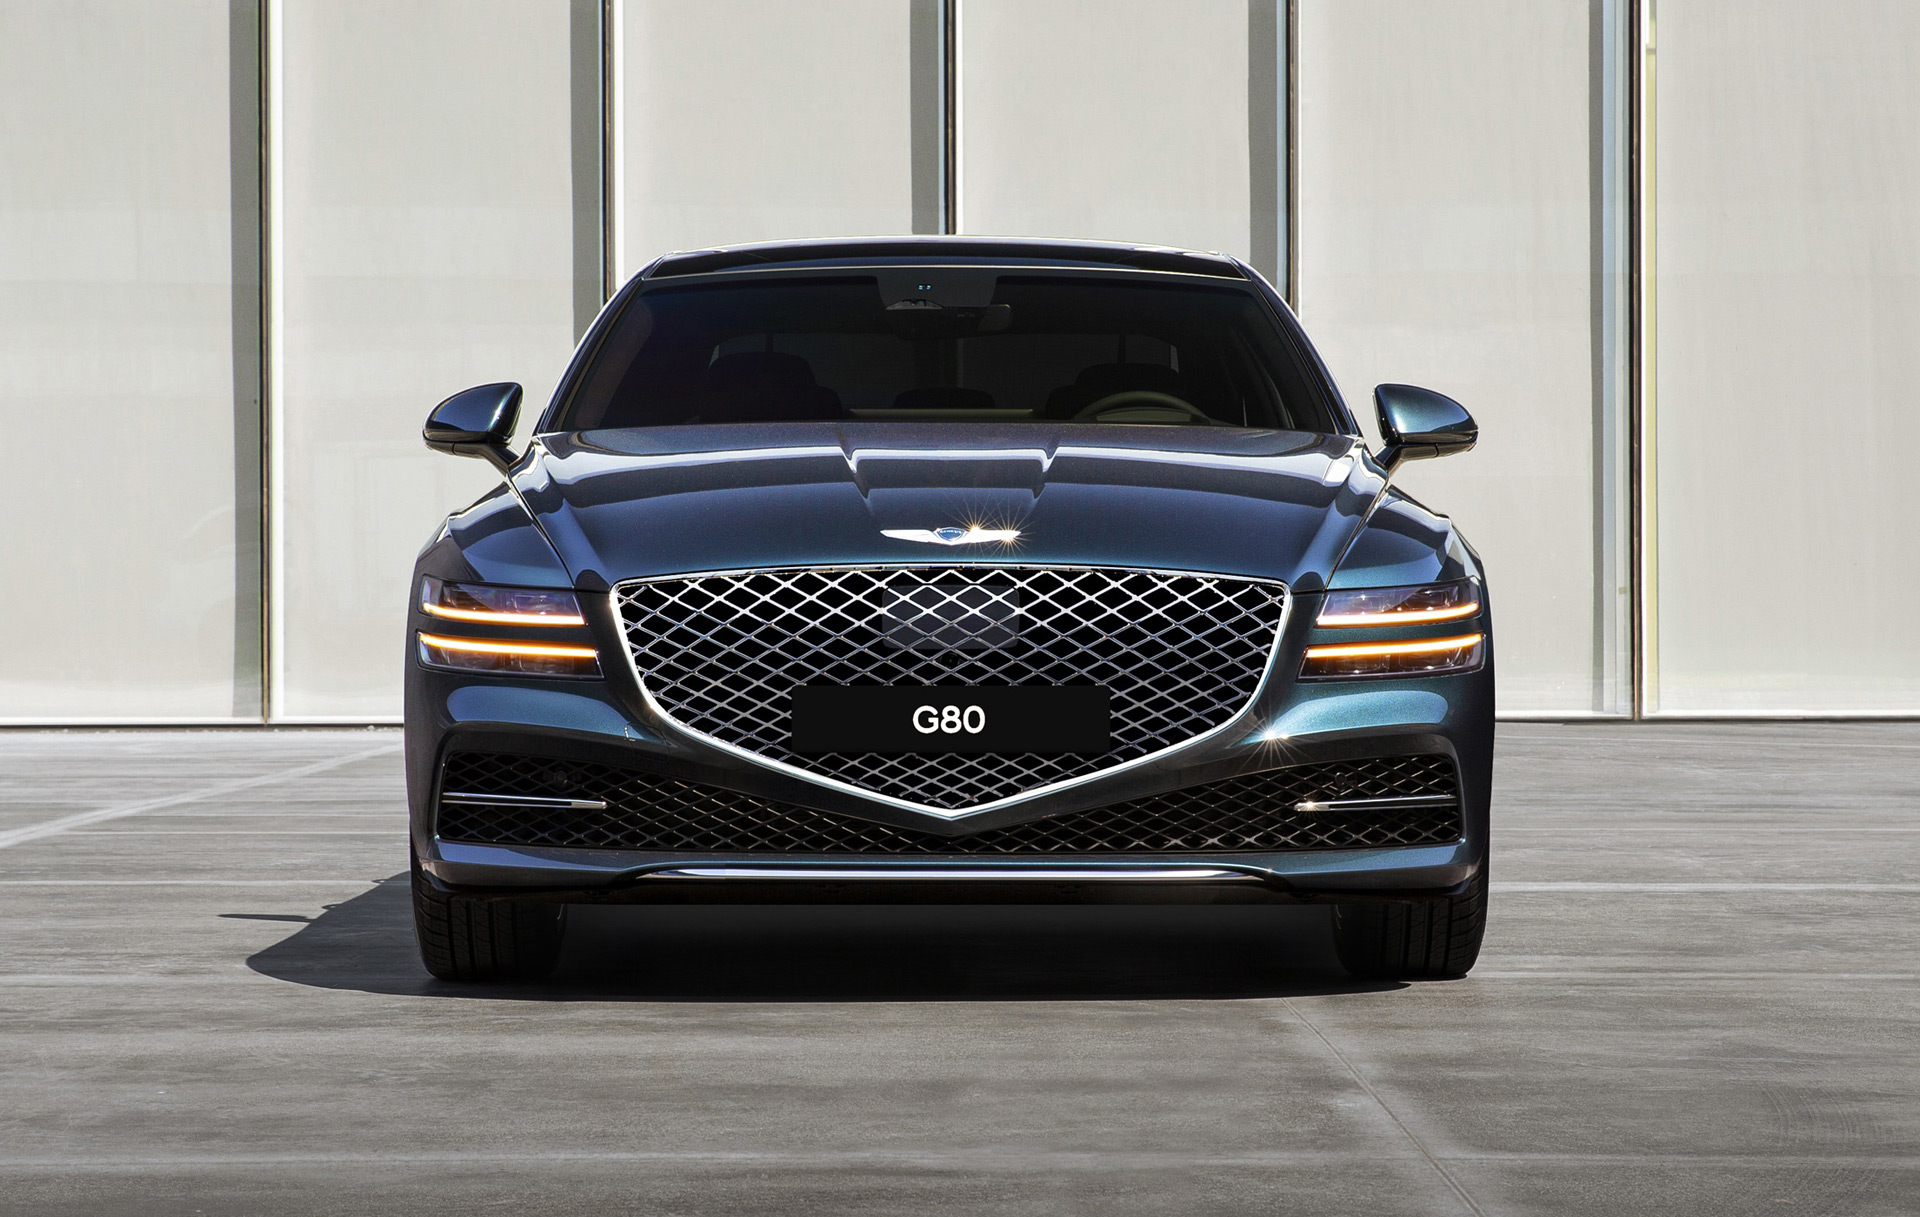 2021 Genesis G80, 2021 Rolls-Royce Ghost, 2020 Detroit auto show: Today's Car News